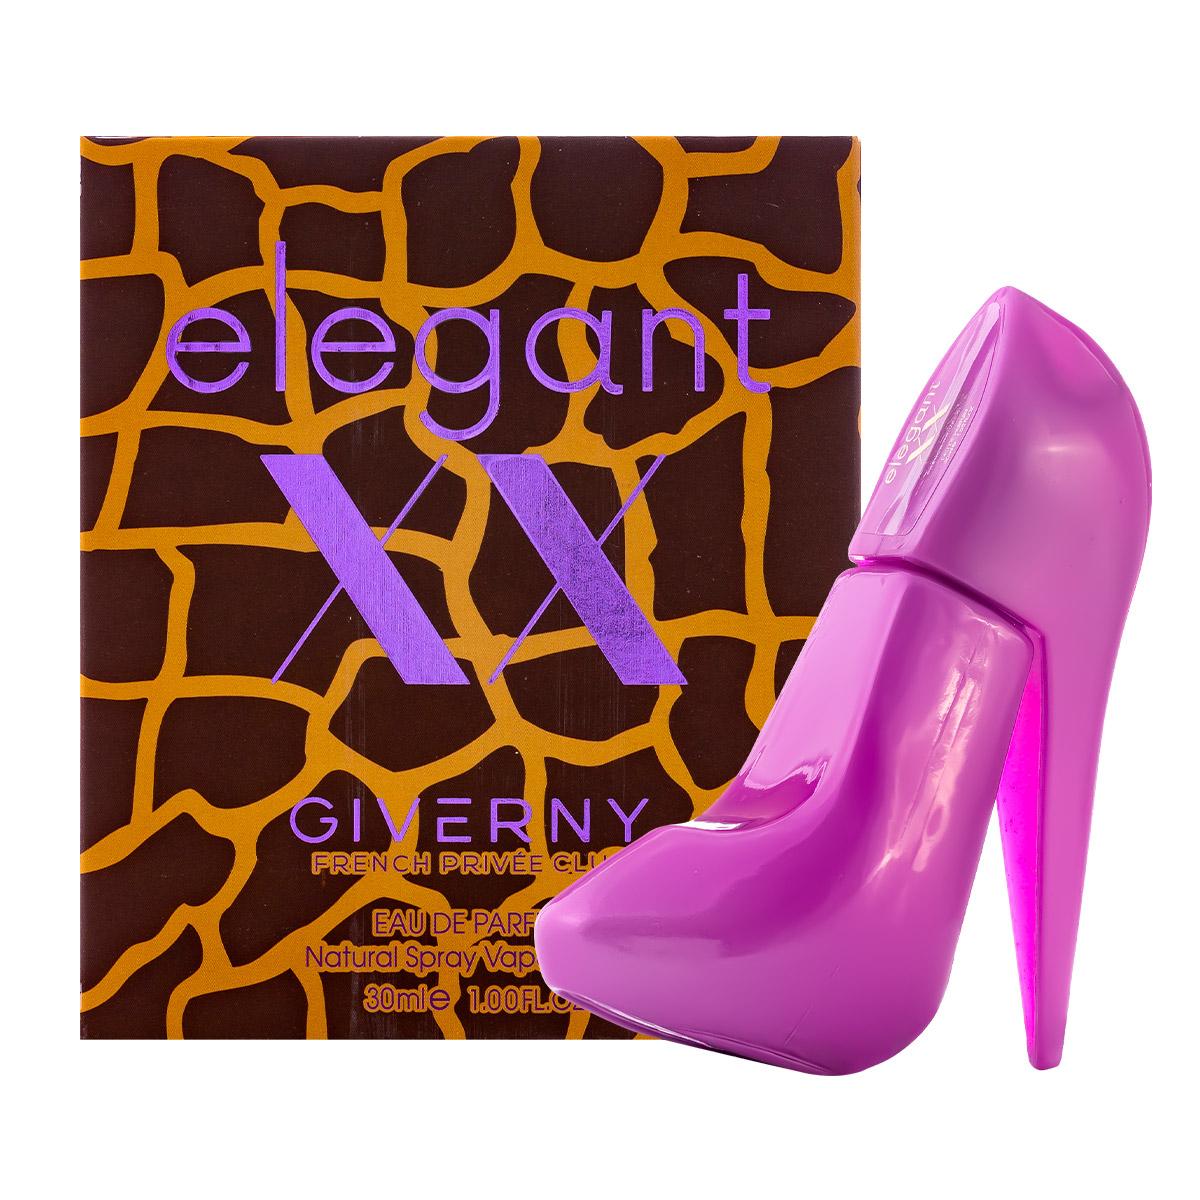 Perfume Elegant XX Sapatinho Feminino EDP 30ml Giverny  - Mercari Perfumes